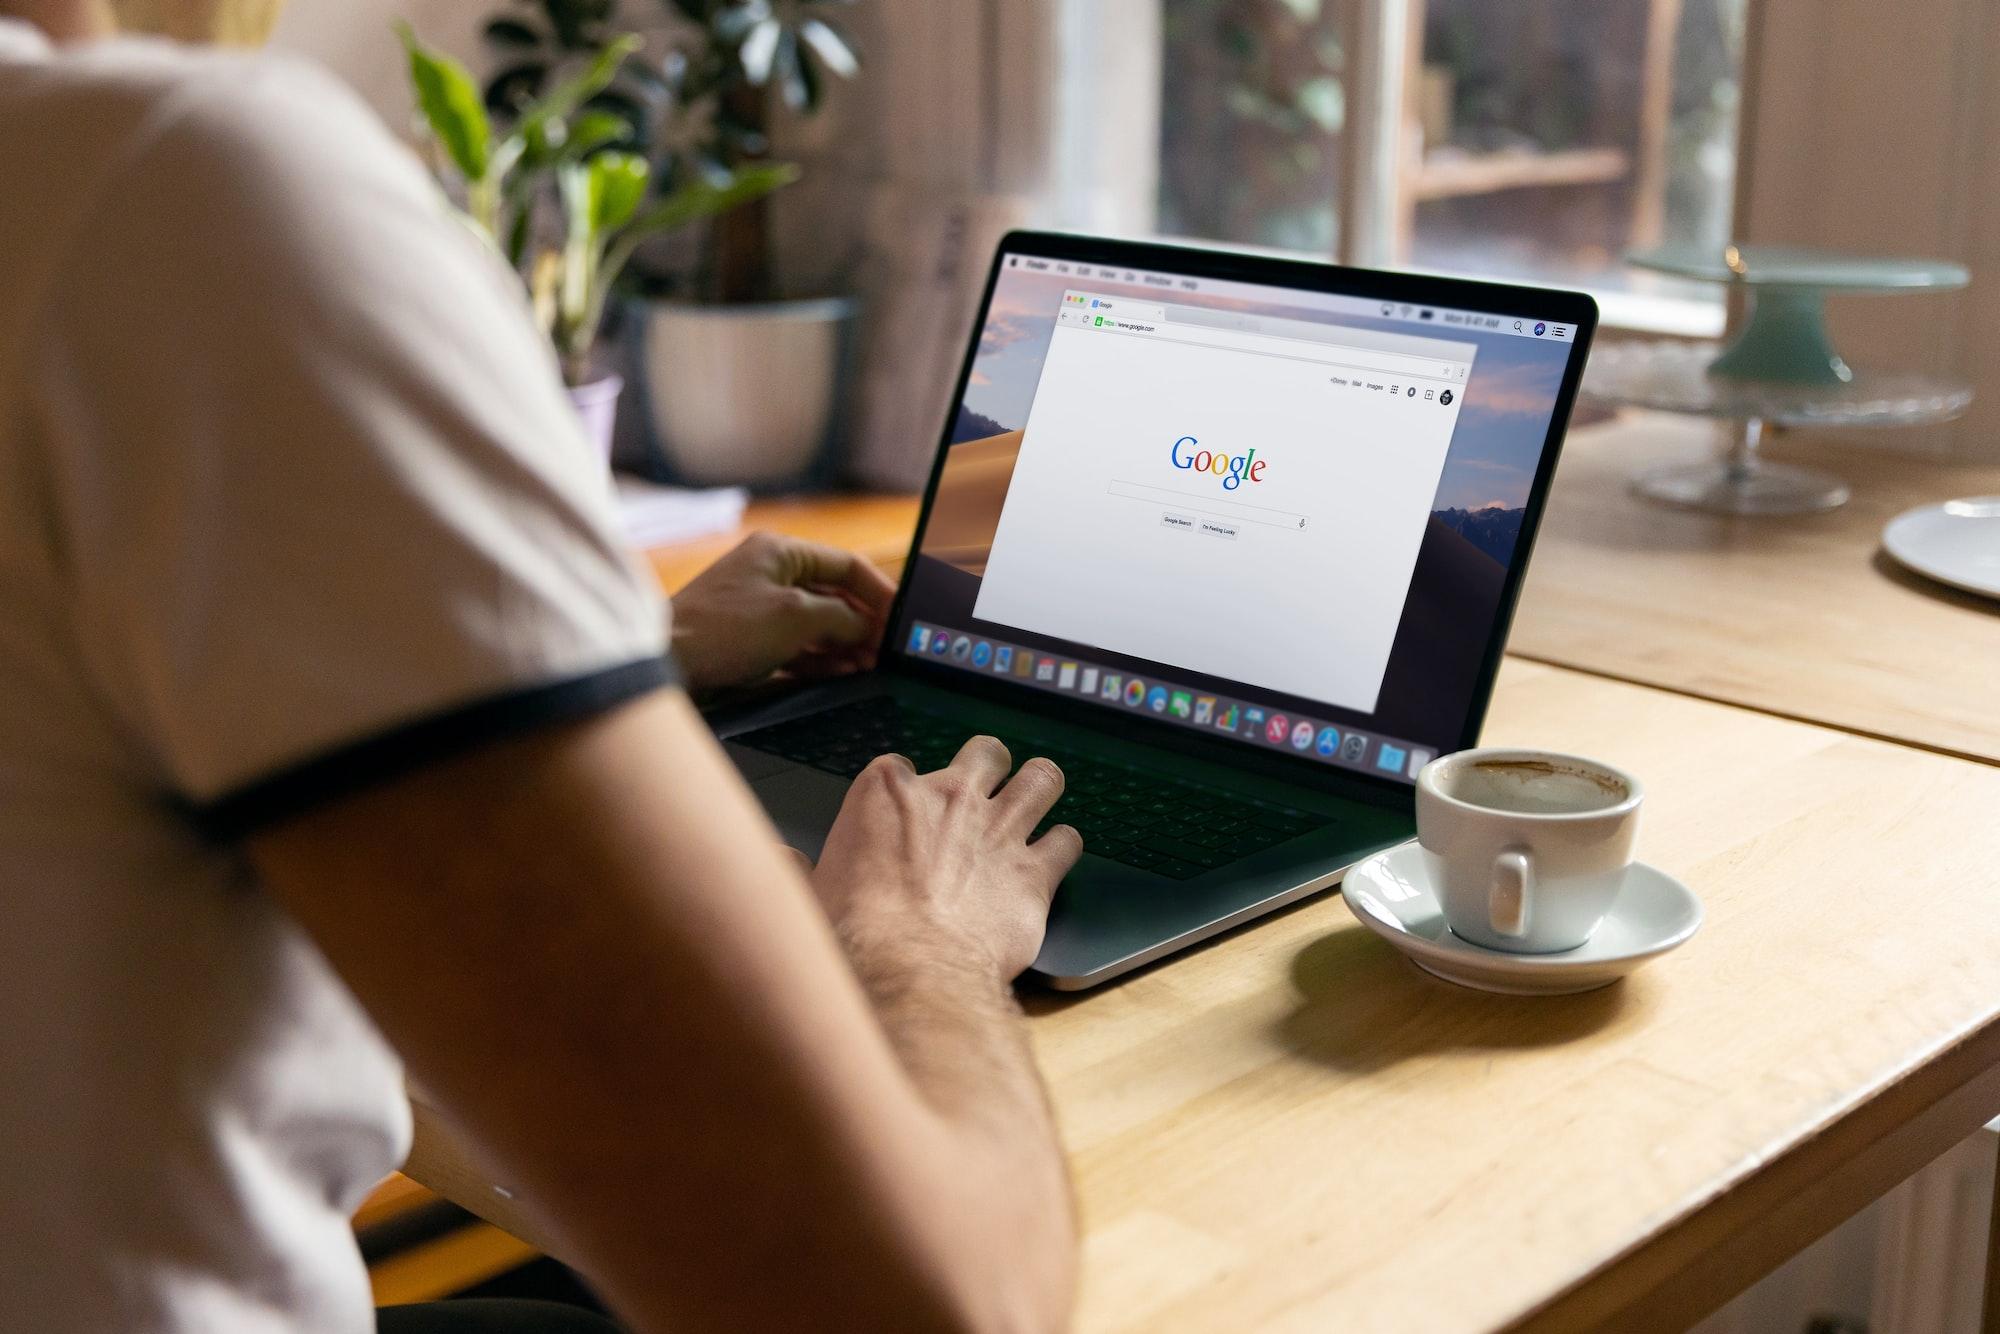 Google ADS ed il metodo Hagakure